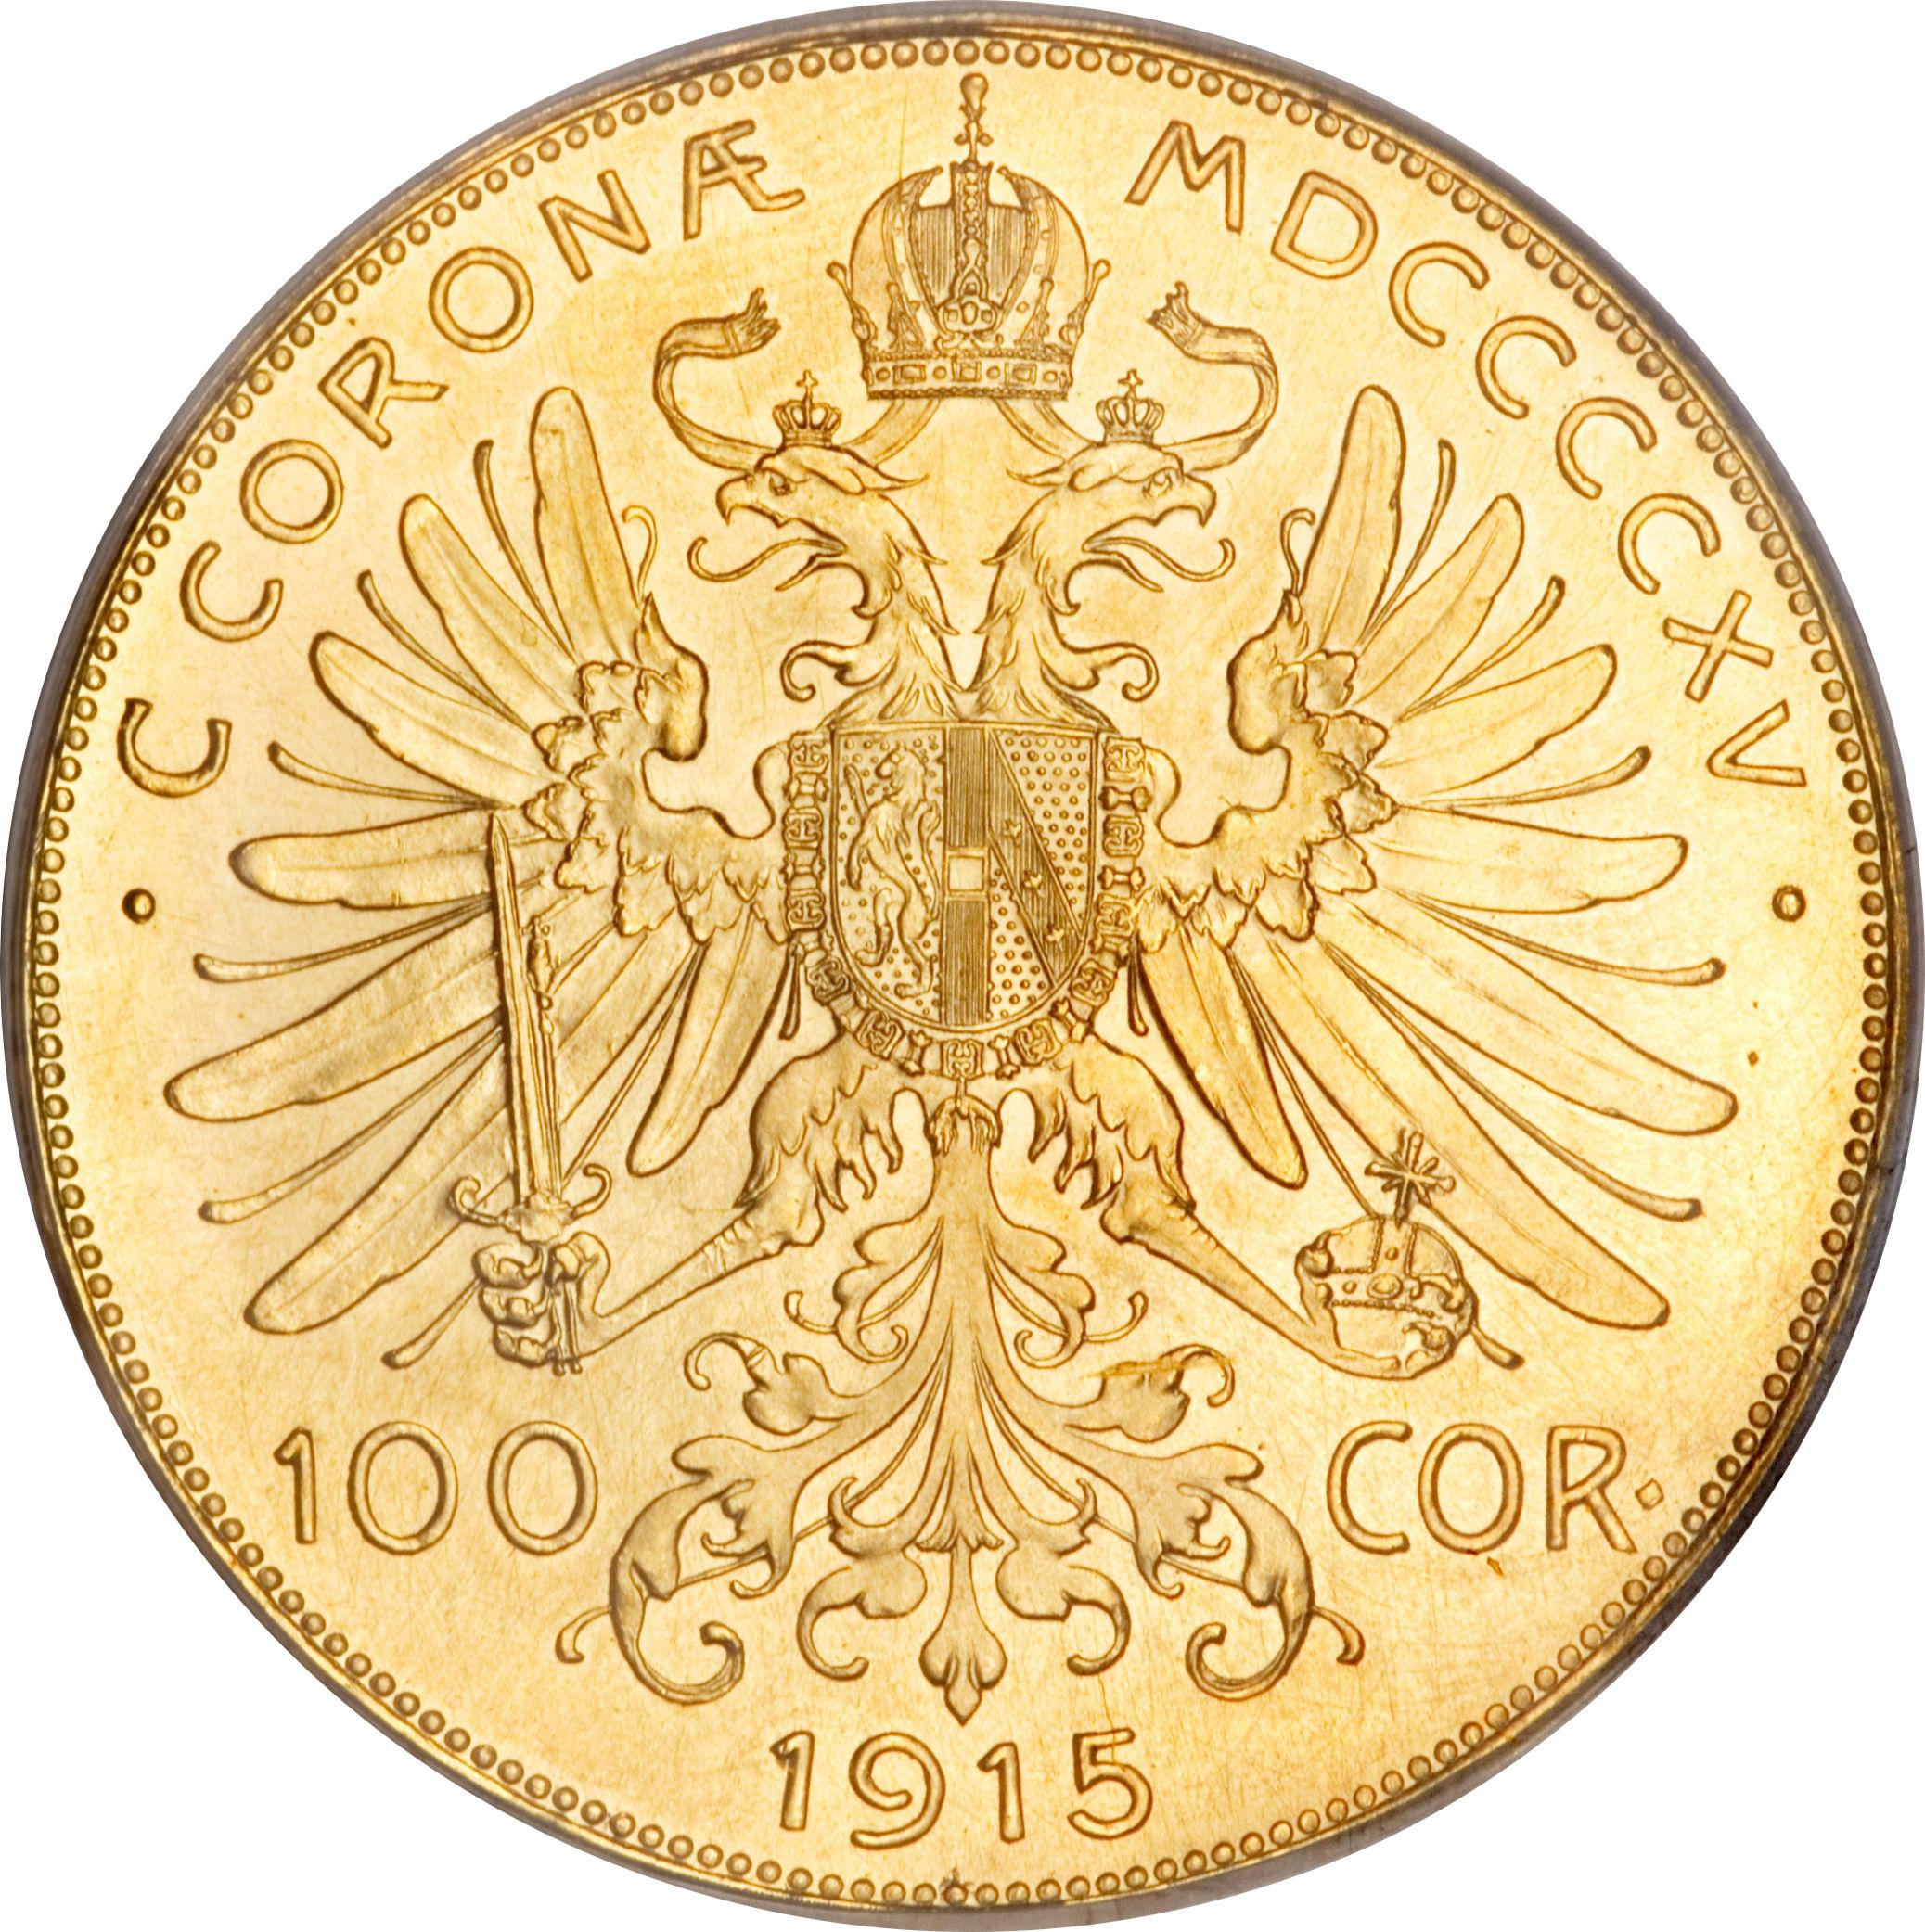 G 1915 Austrian 100 Corona Value